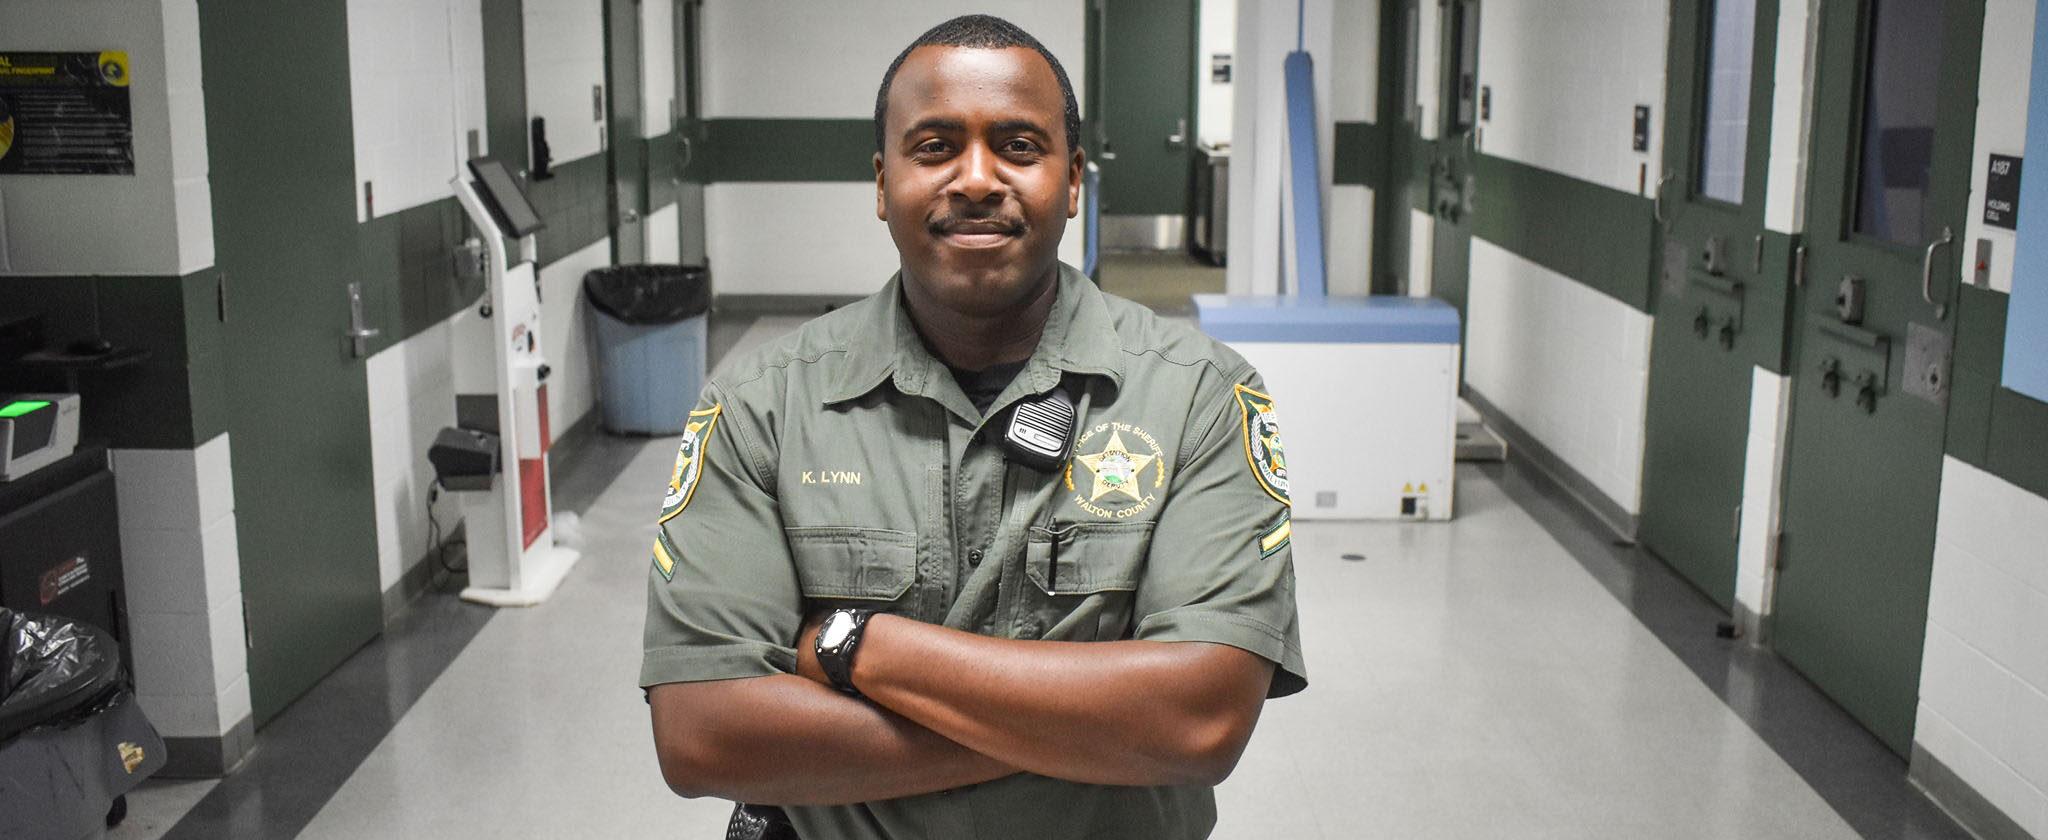 Walton County Sheriff's Office | Walton County, Florida